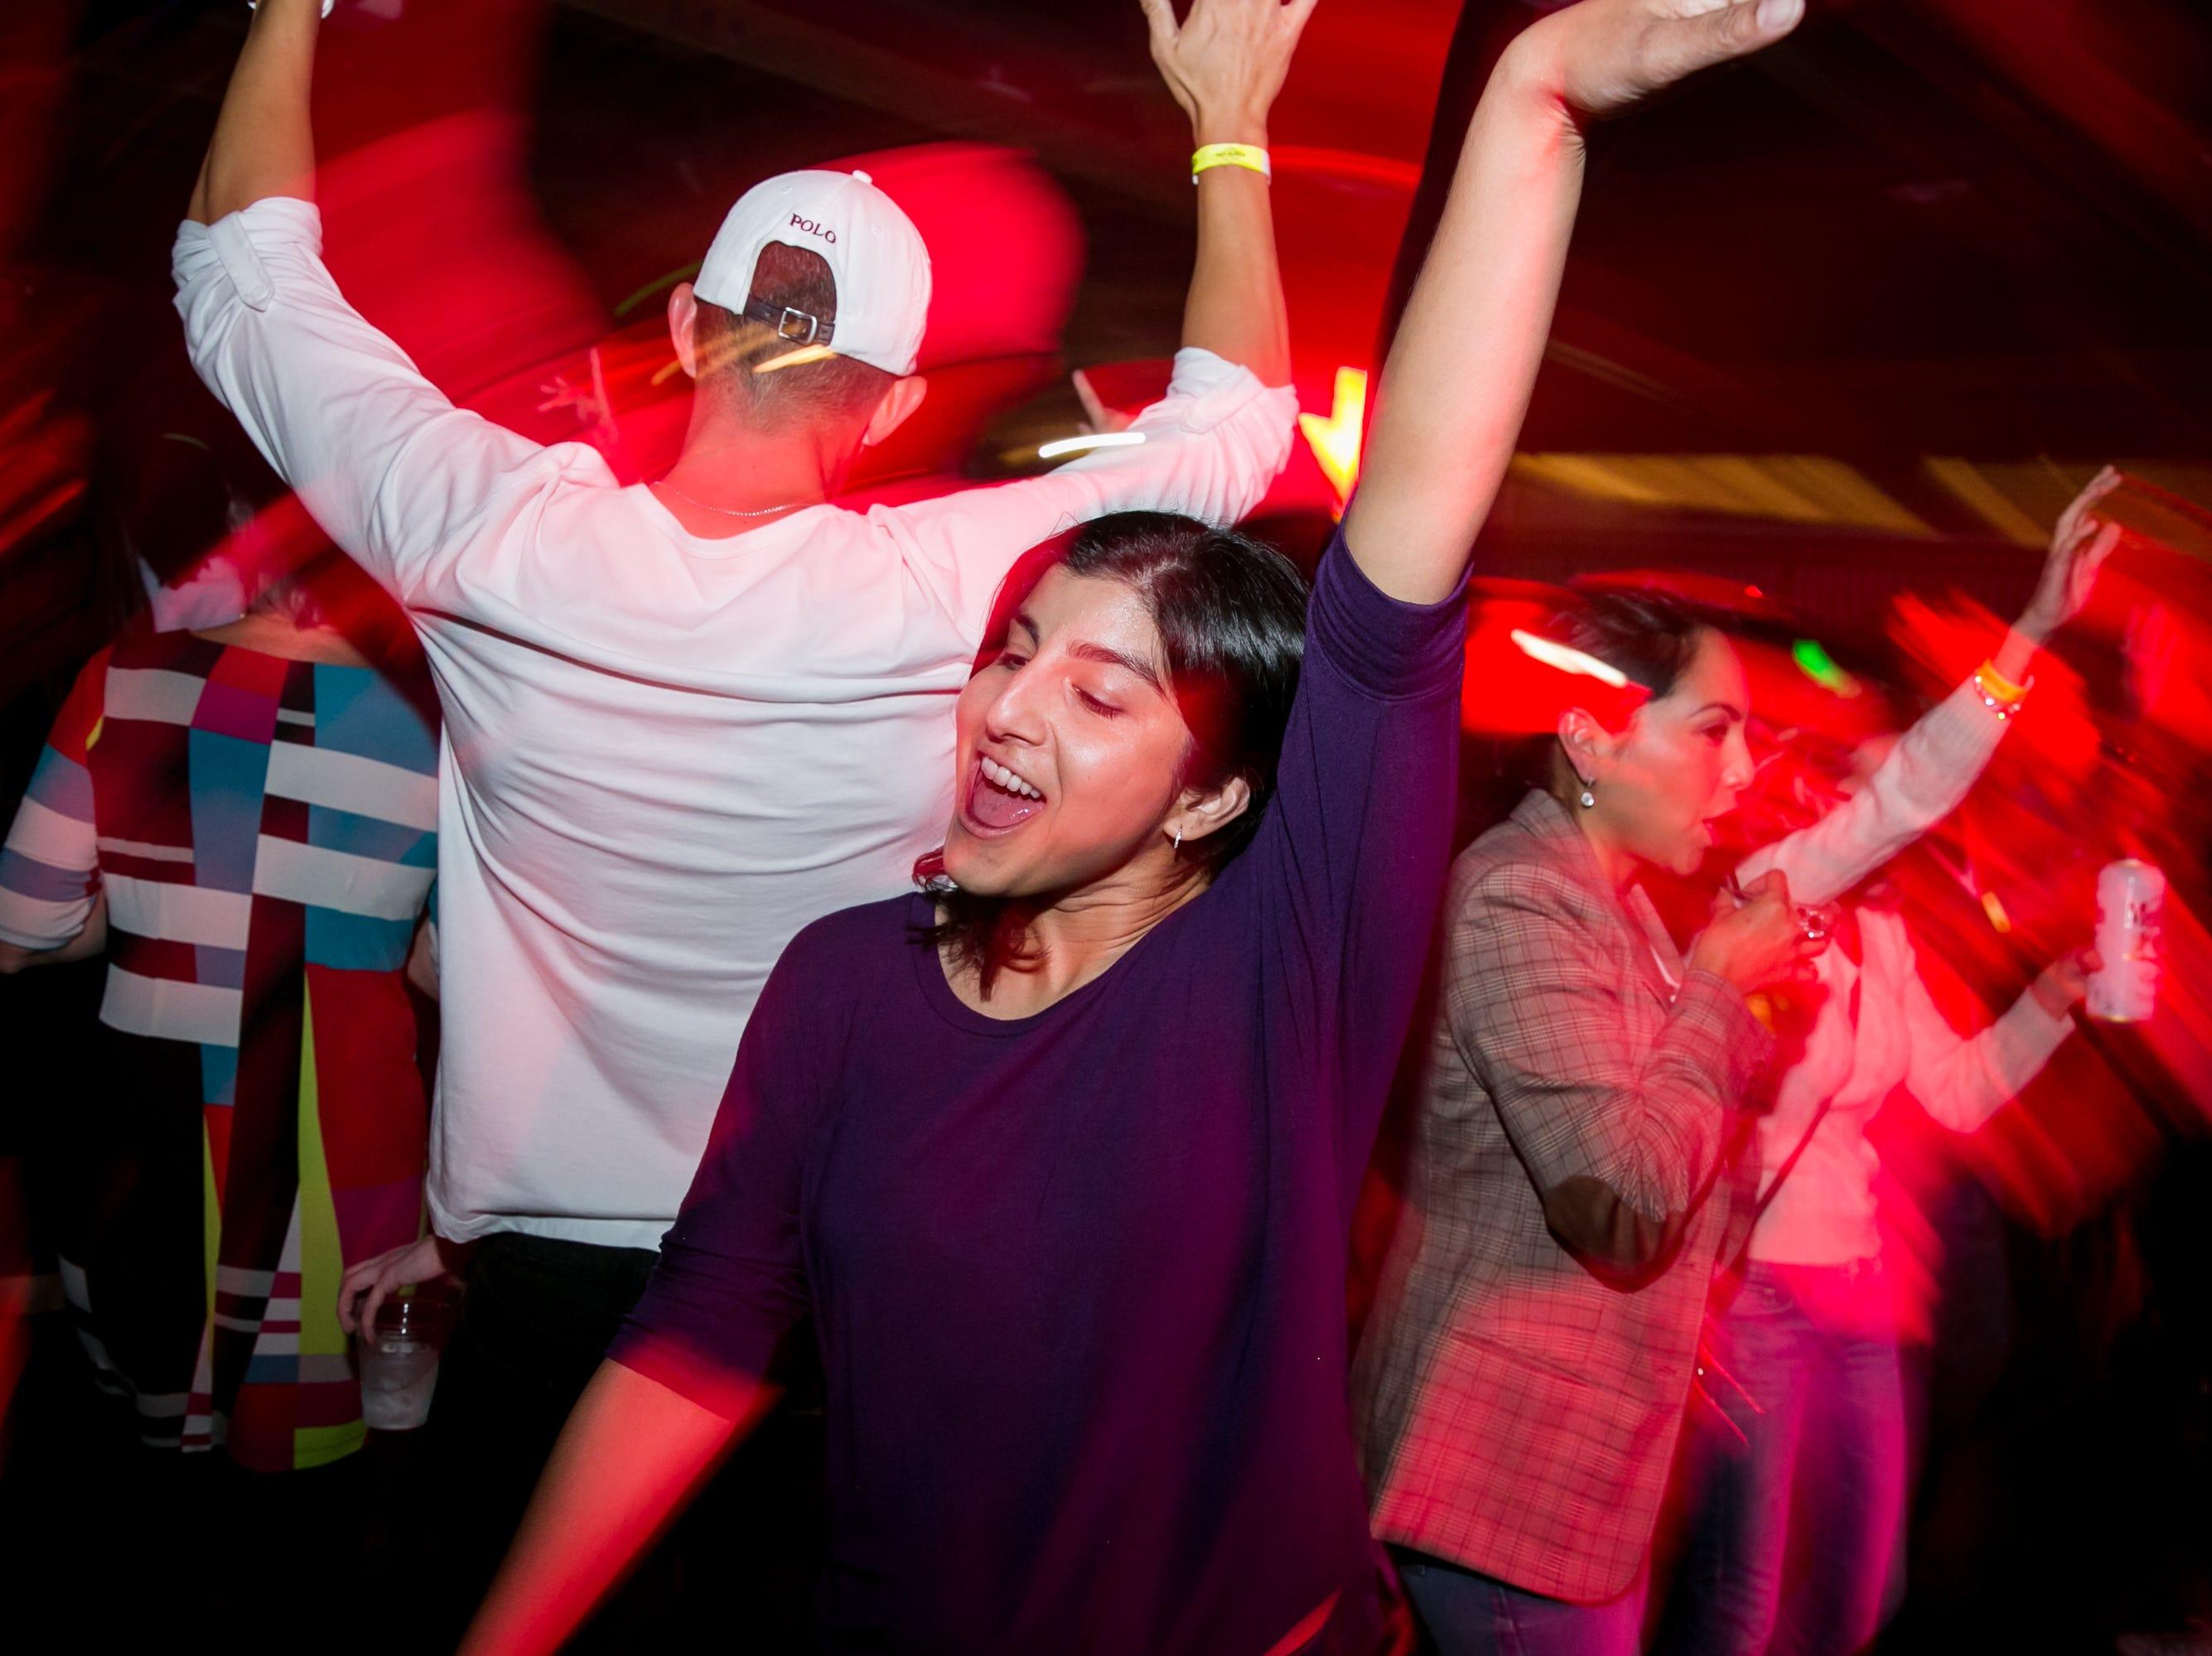 Everyone had fun dancing during Old School - 90's Hip Hop Dance Party at The Van Buren on Friday, November 30, 2018.